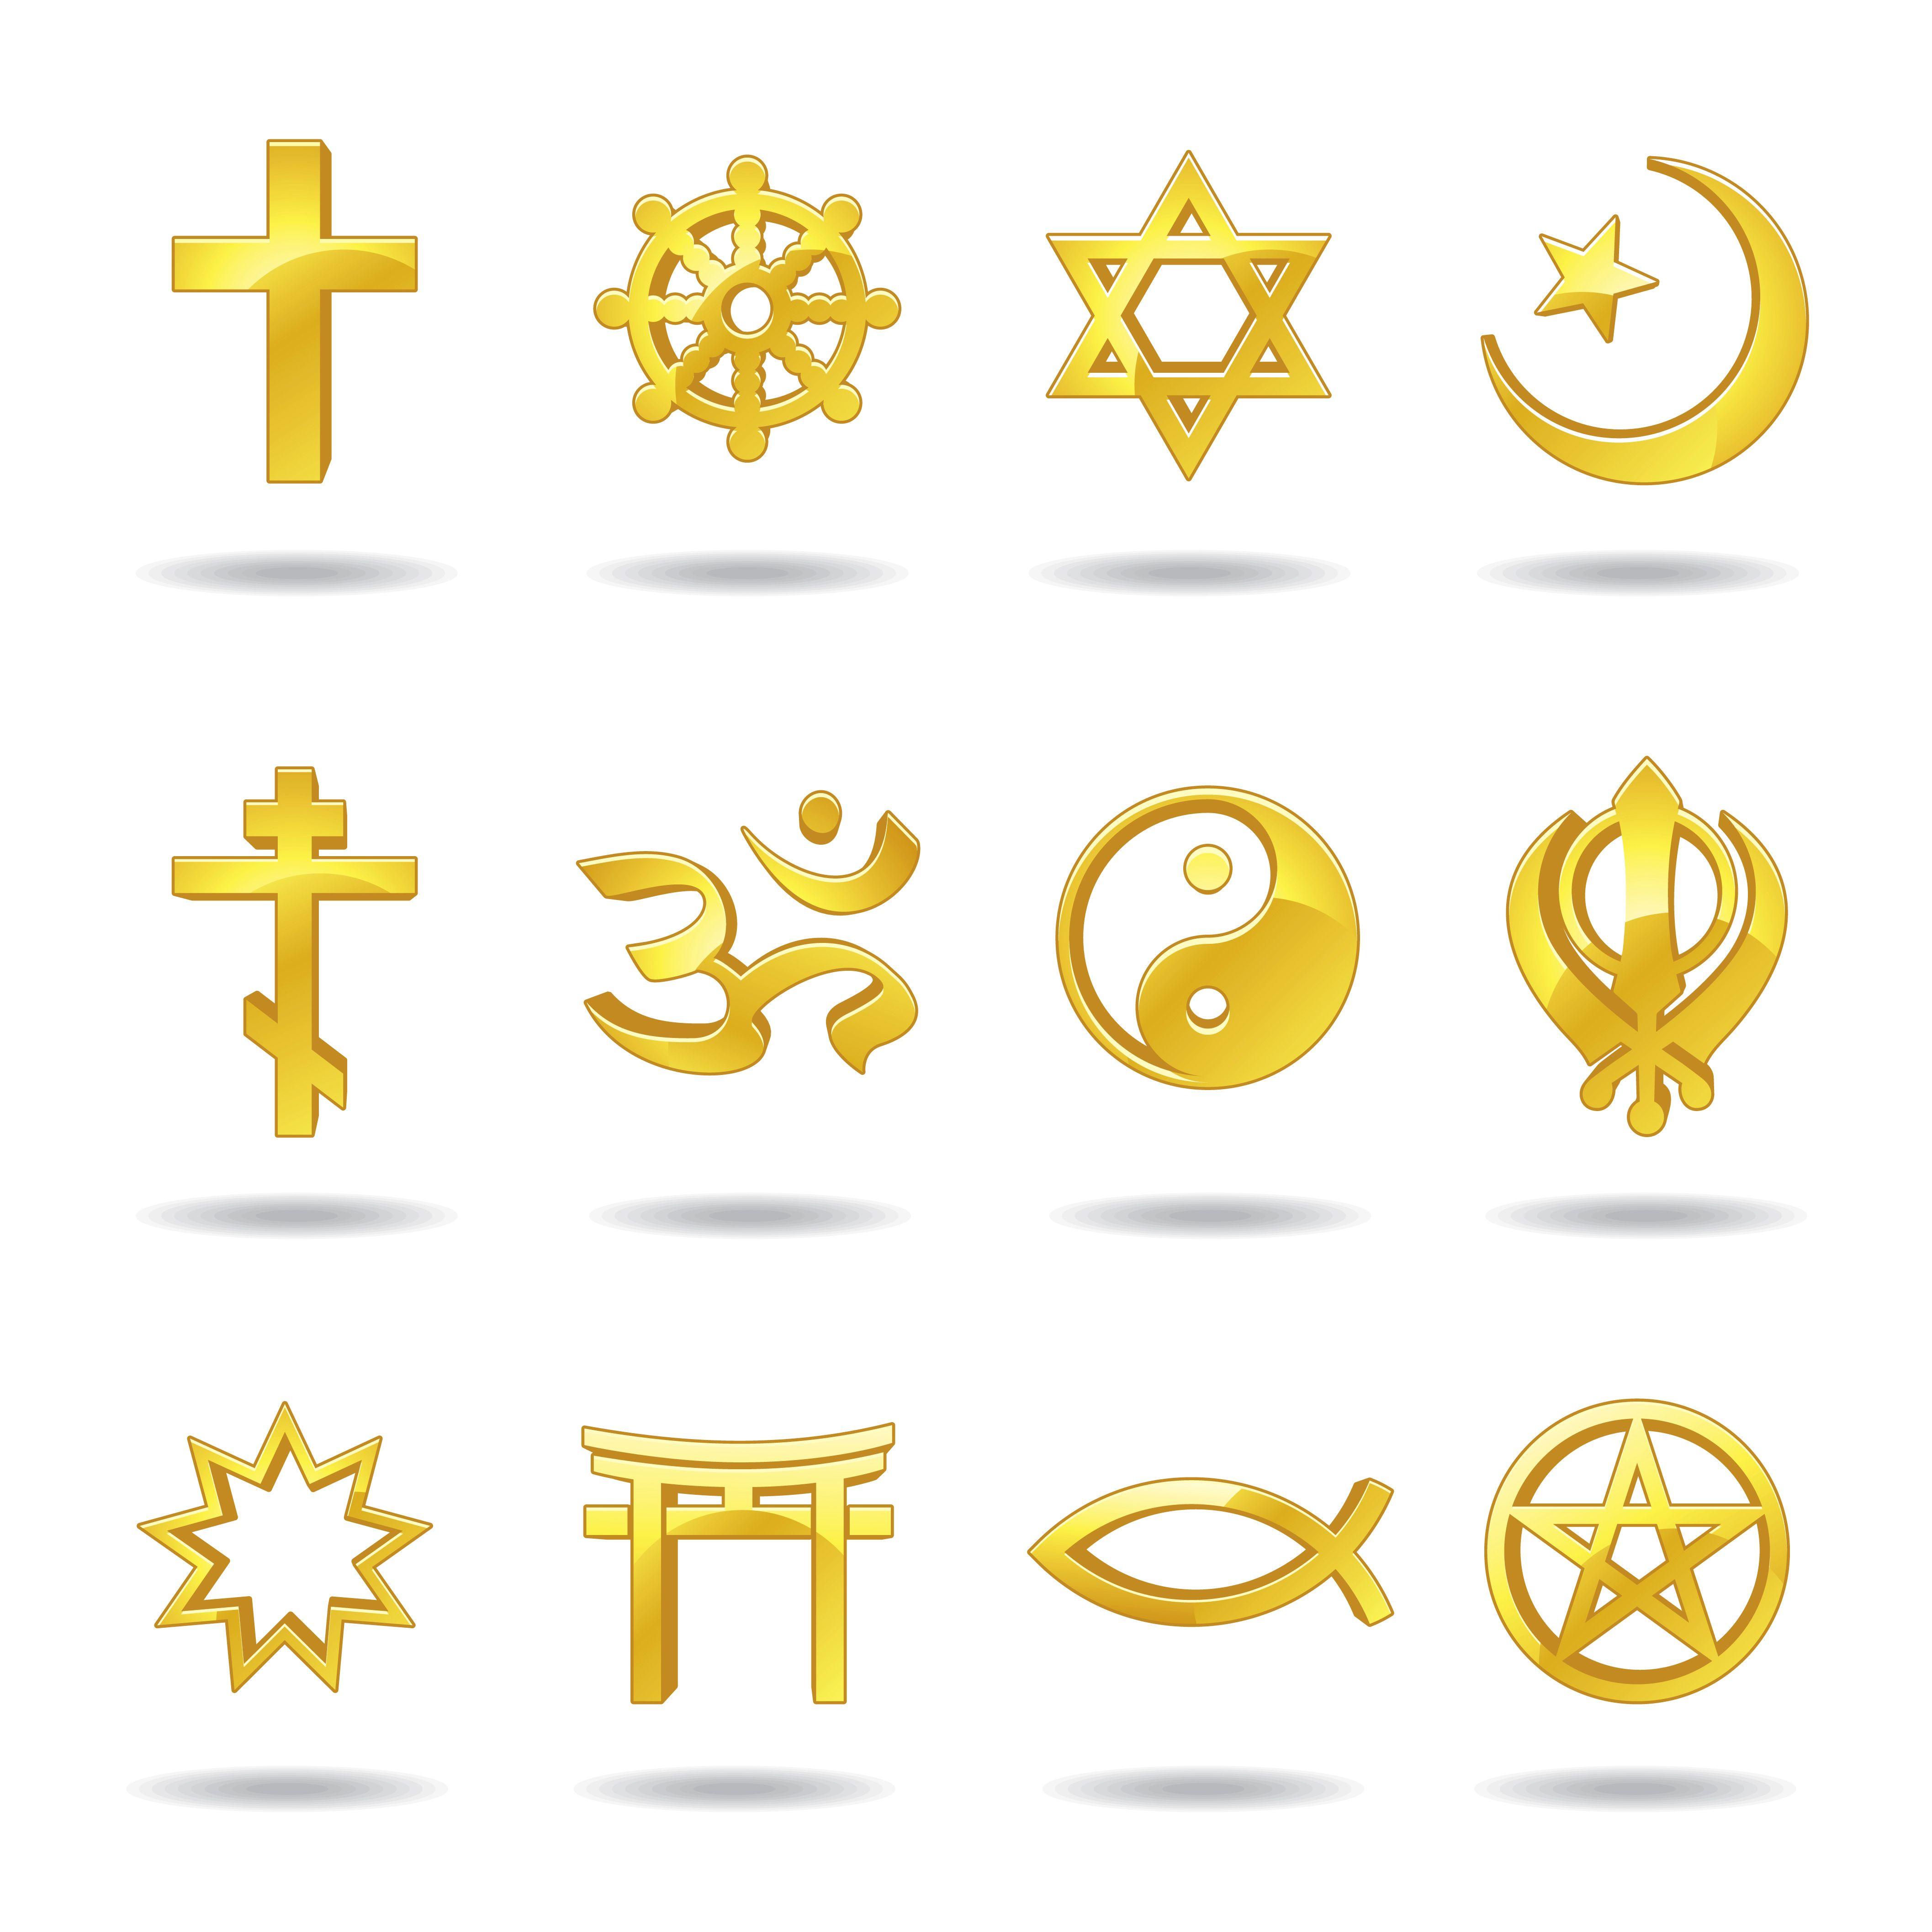 religioussymbols religioussymbols � first amendment